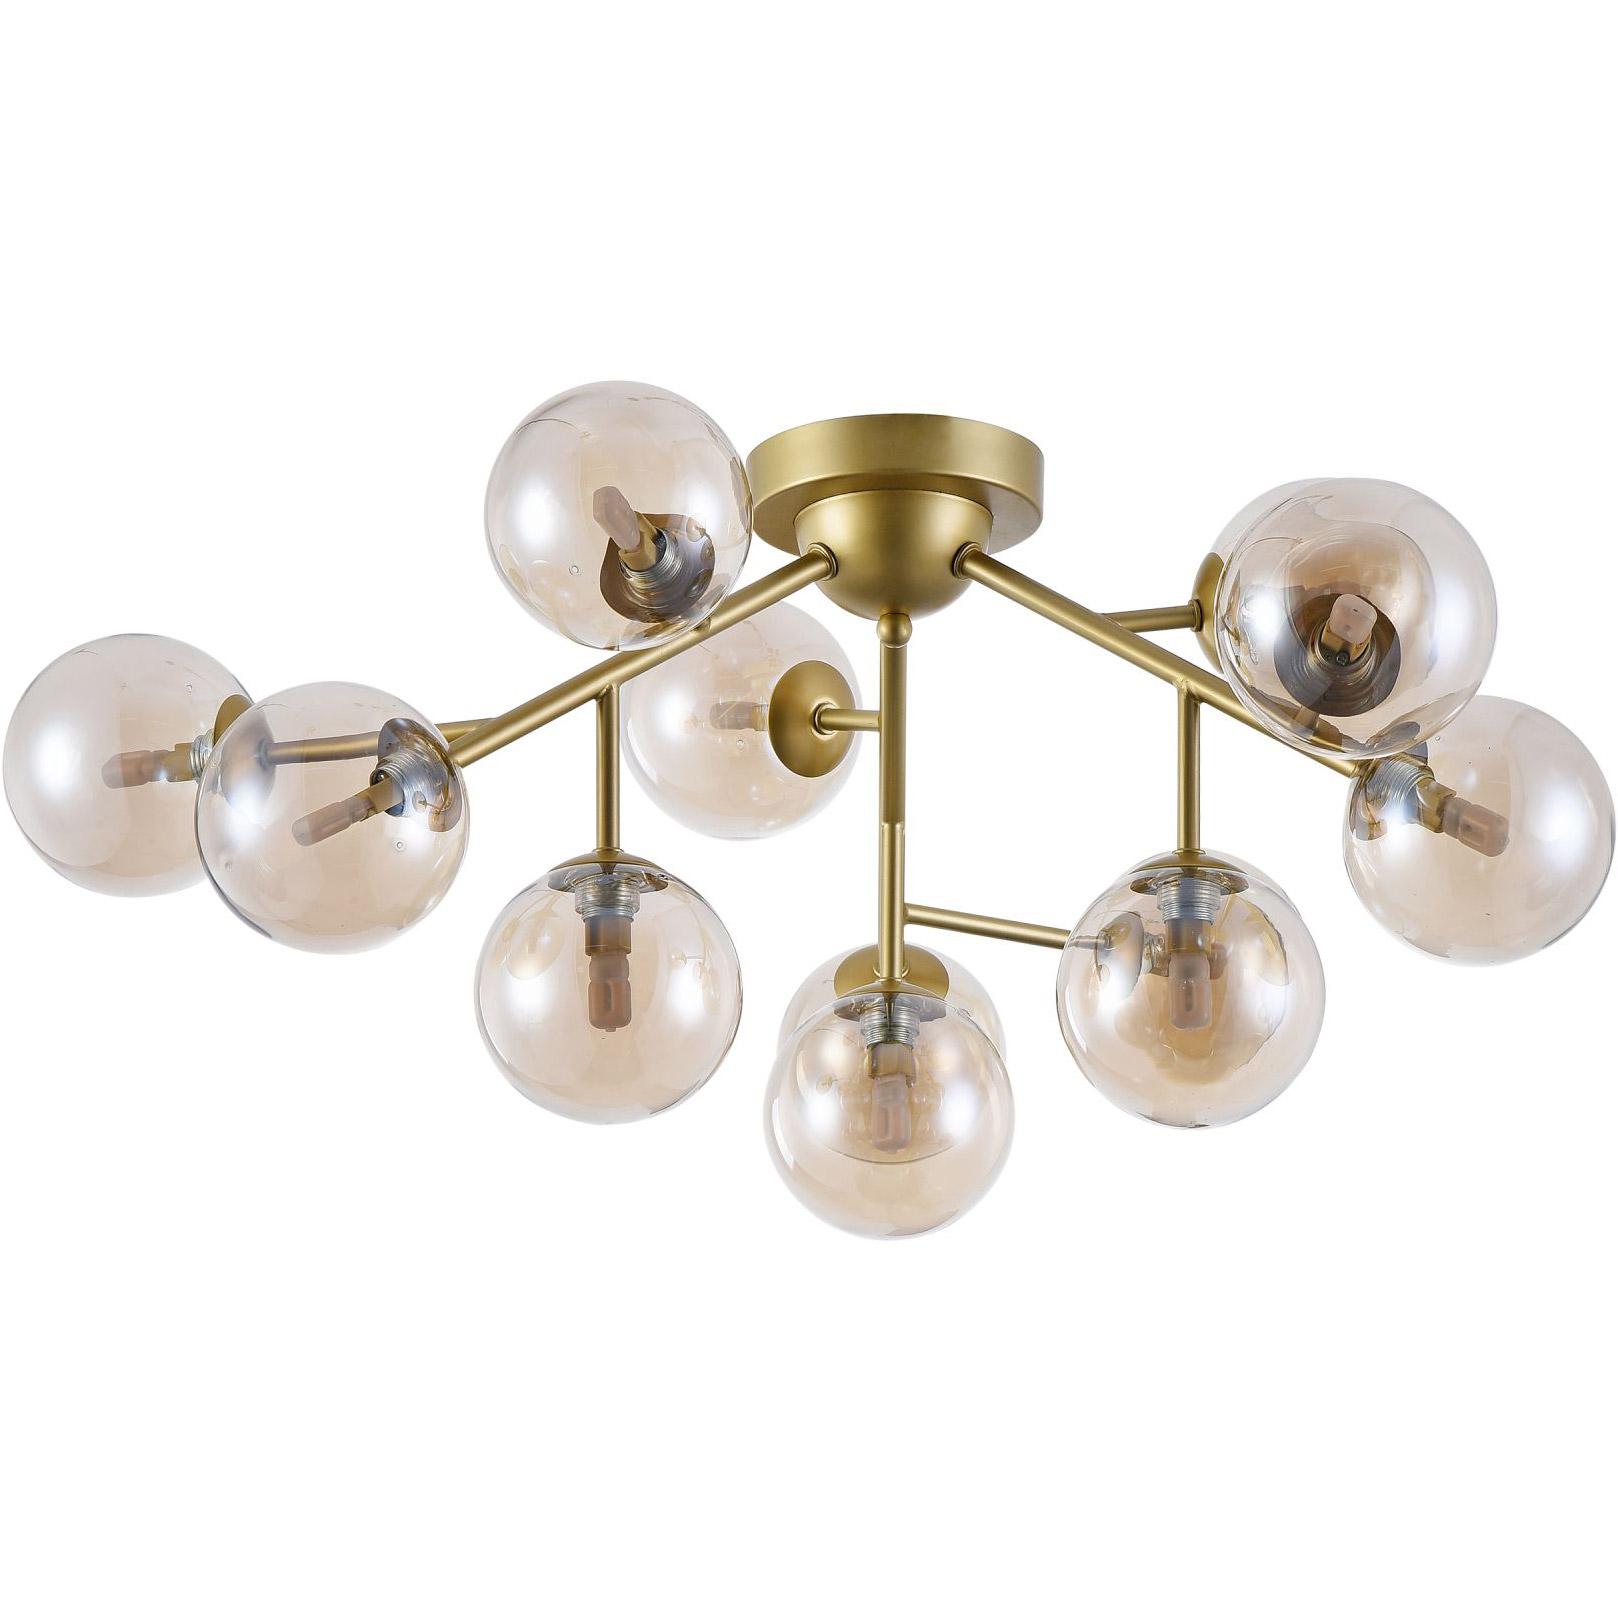 Lampa Sufitowa Zlota Z Bursztynowymi Kulami Dallas Maytoni Modern